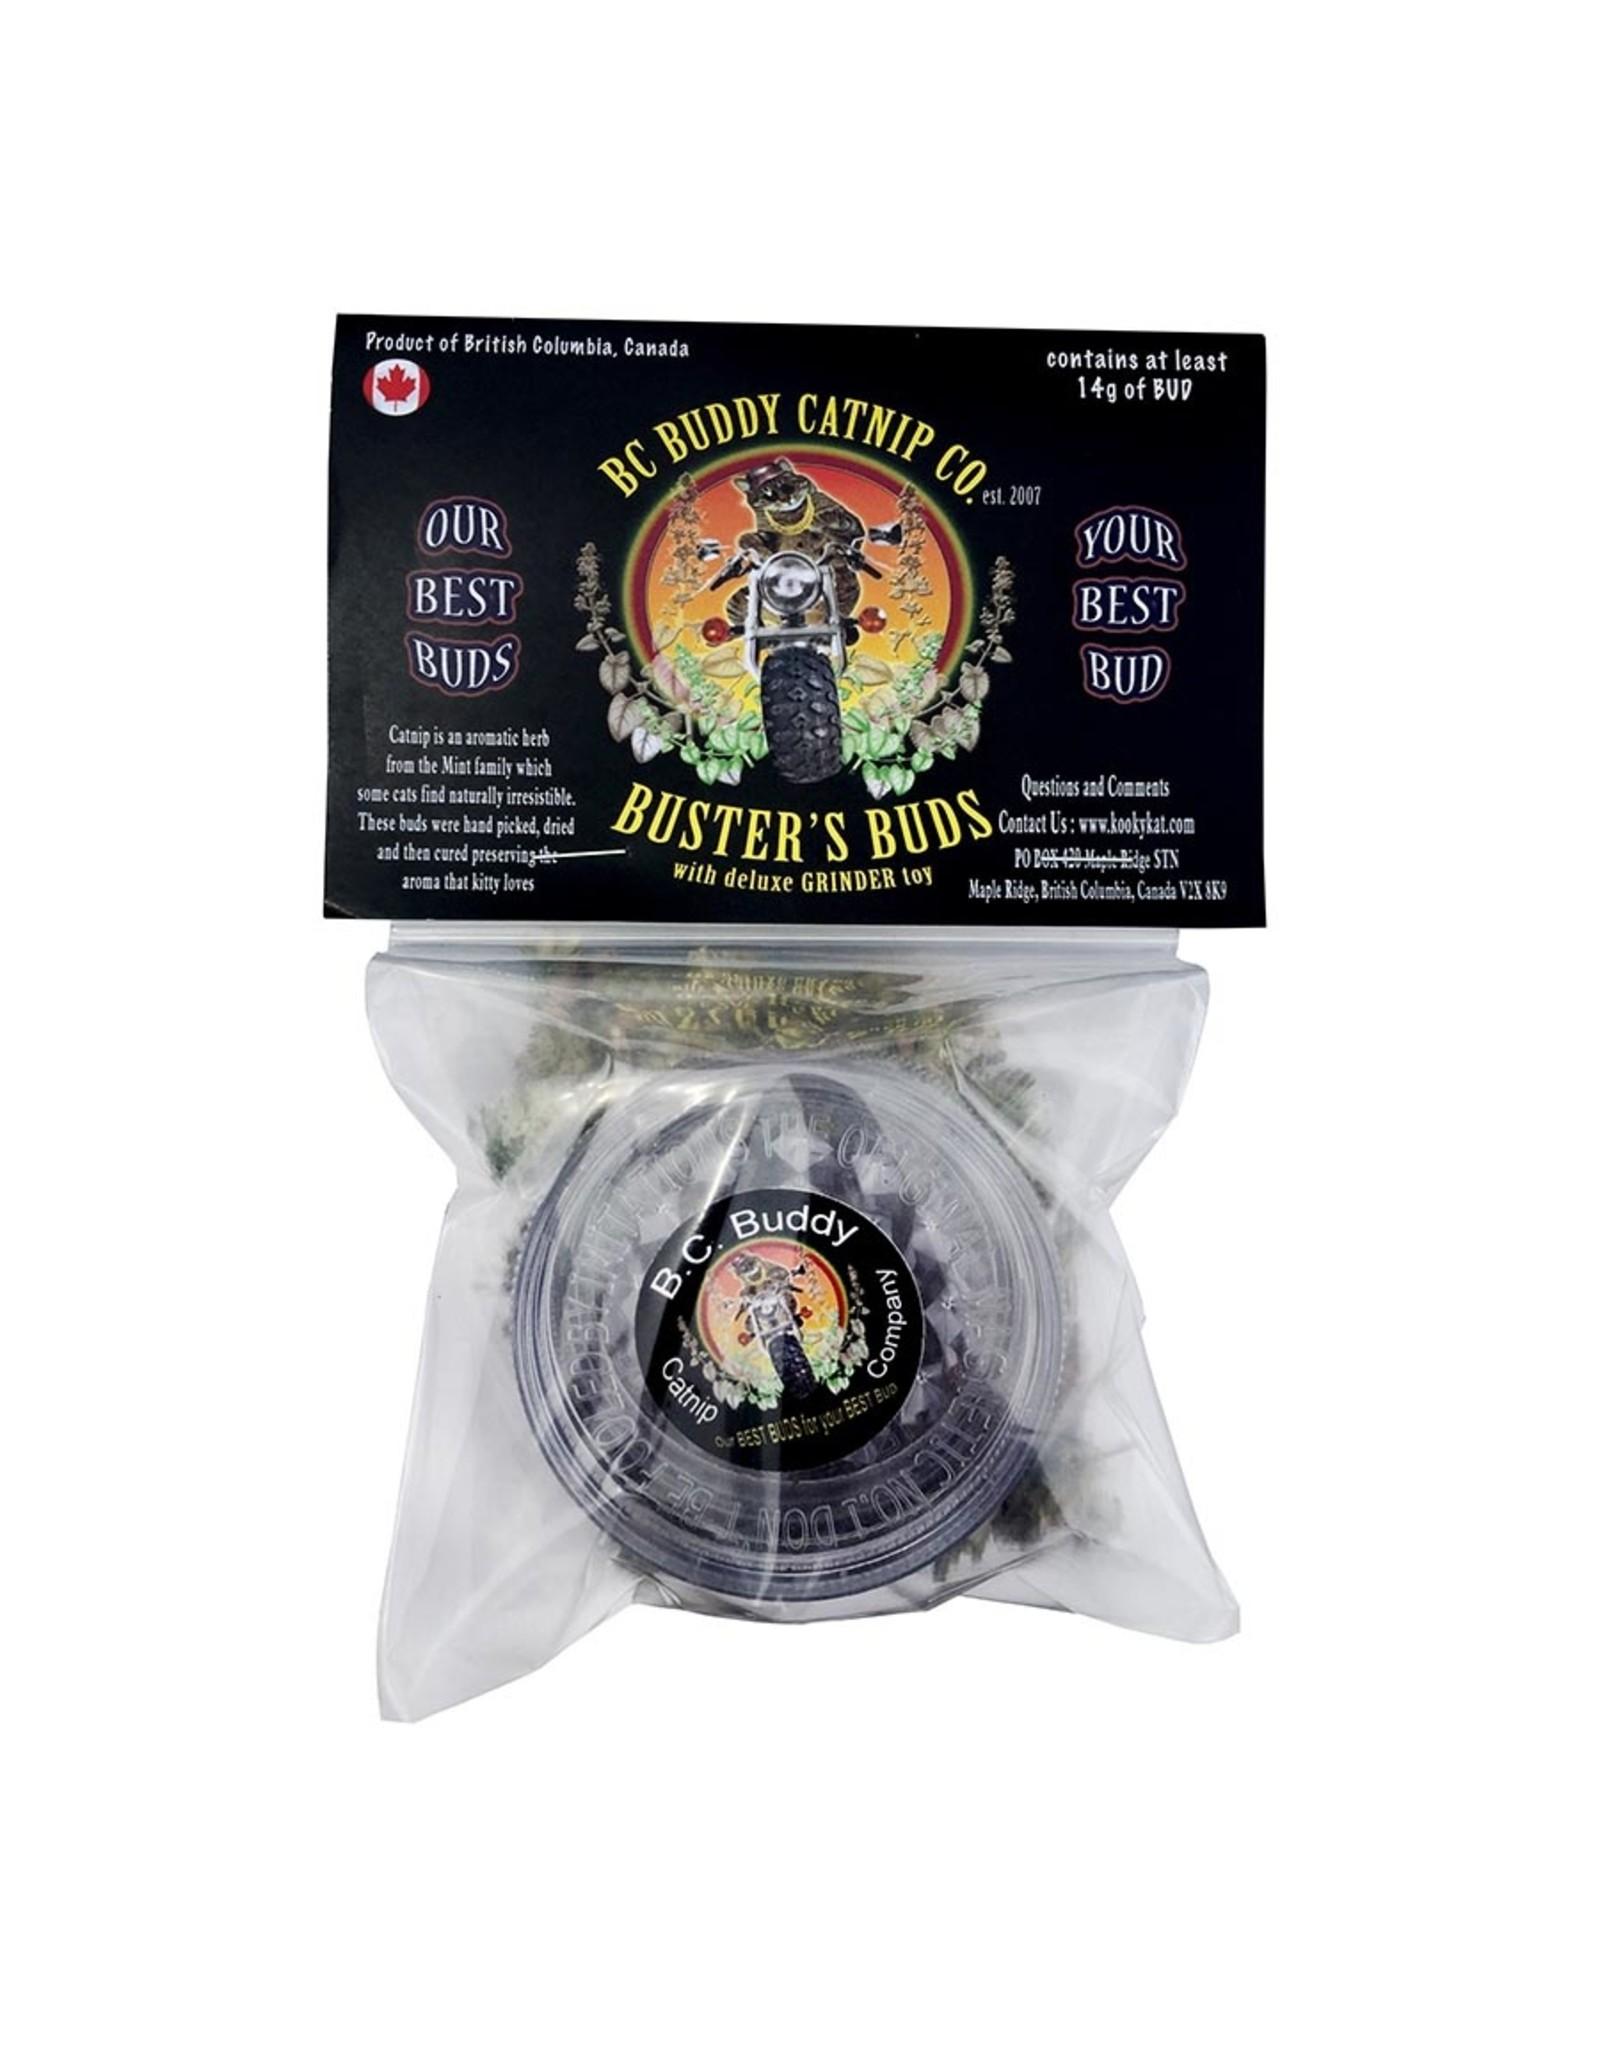 B.C. Buddy Catnip Busters Buds & Grinder